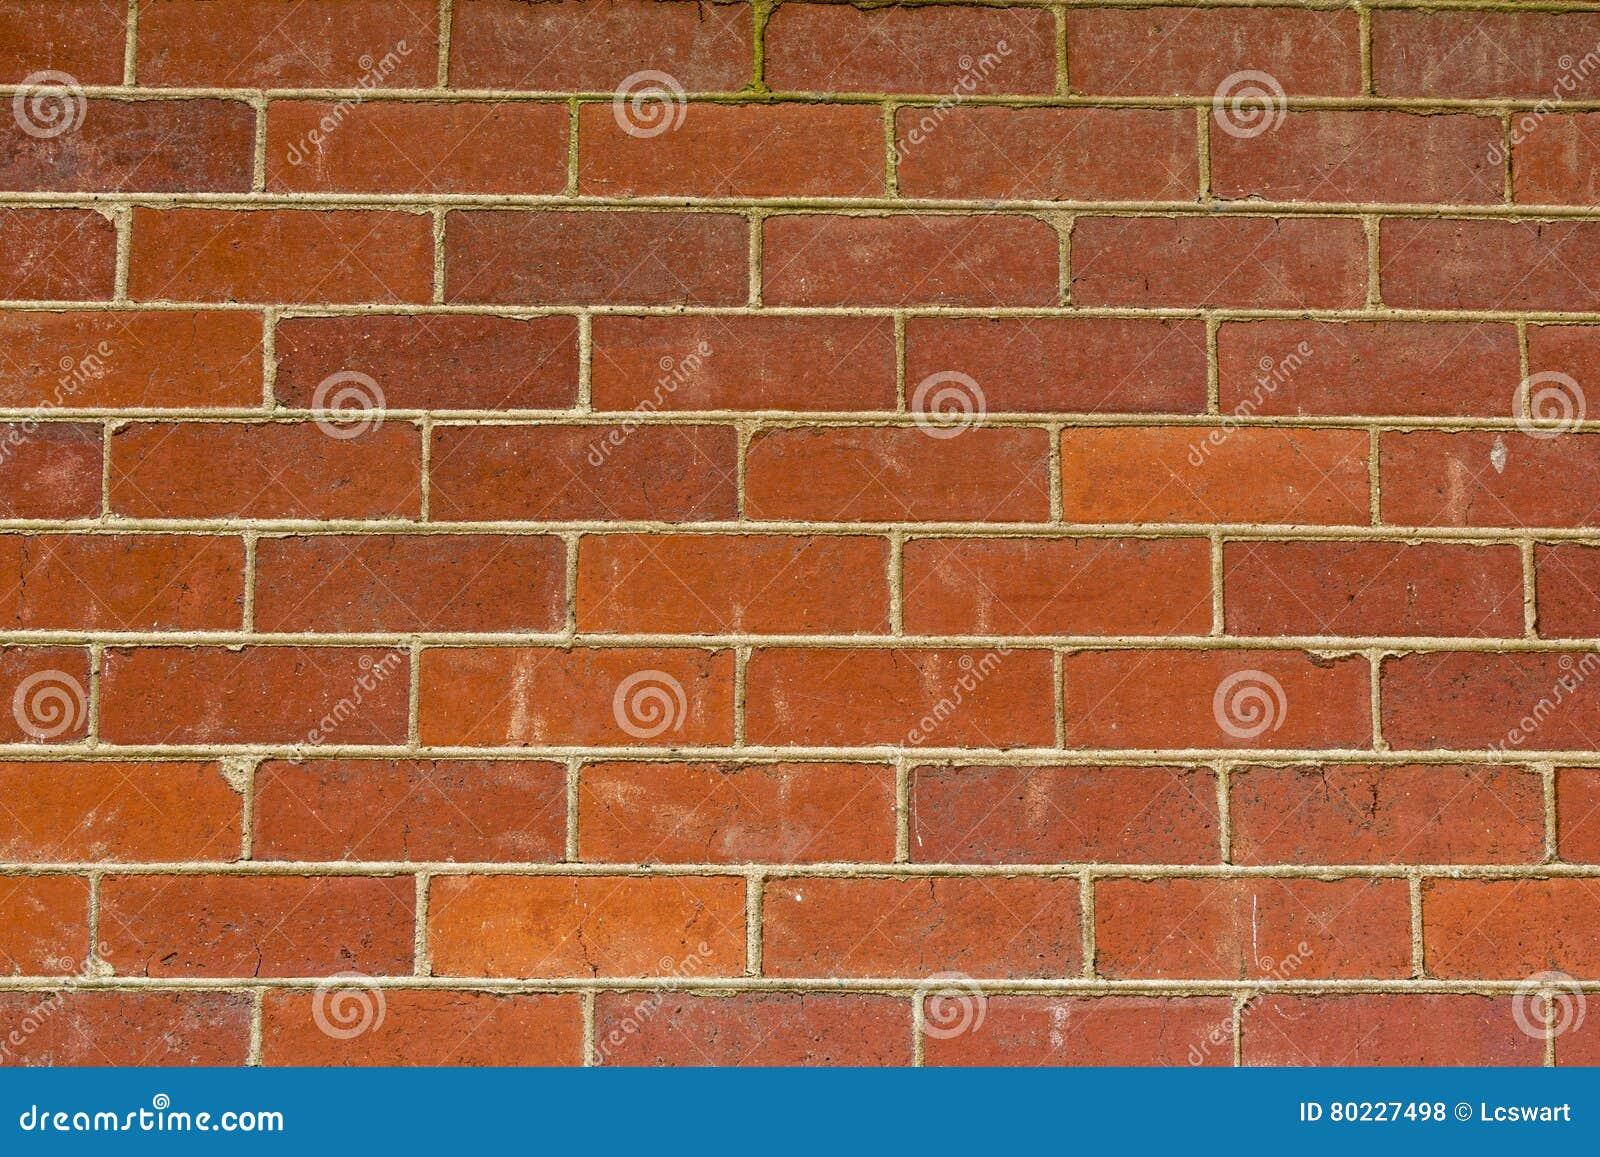 Brick Wall Patterns Cool Ideas